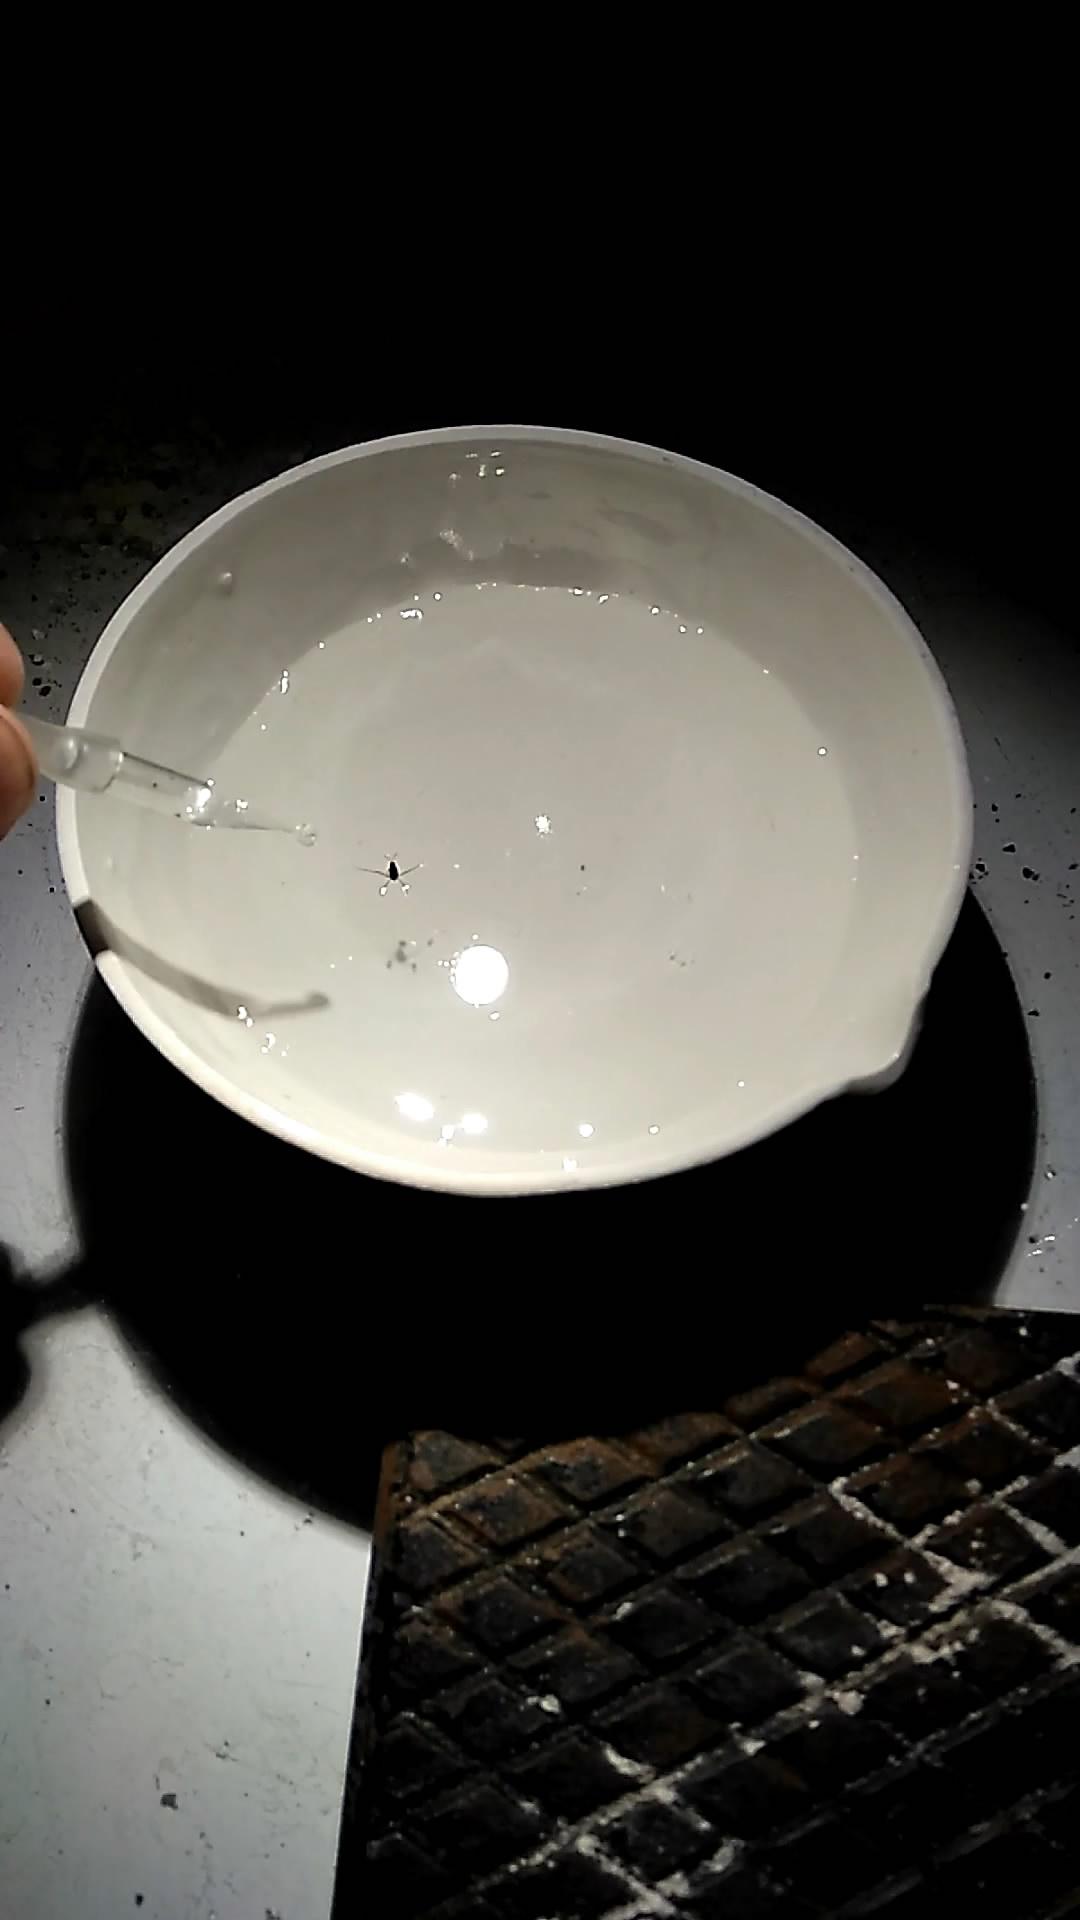 Водомерка и поверхностно-активные вещества. Gerridae and surfactants